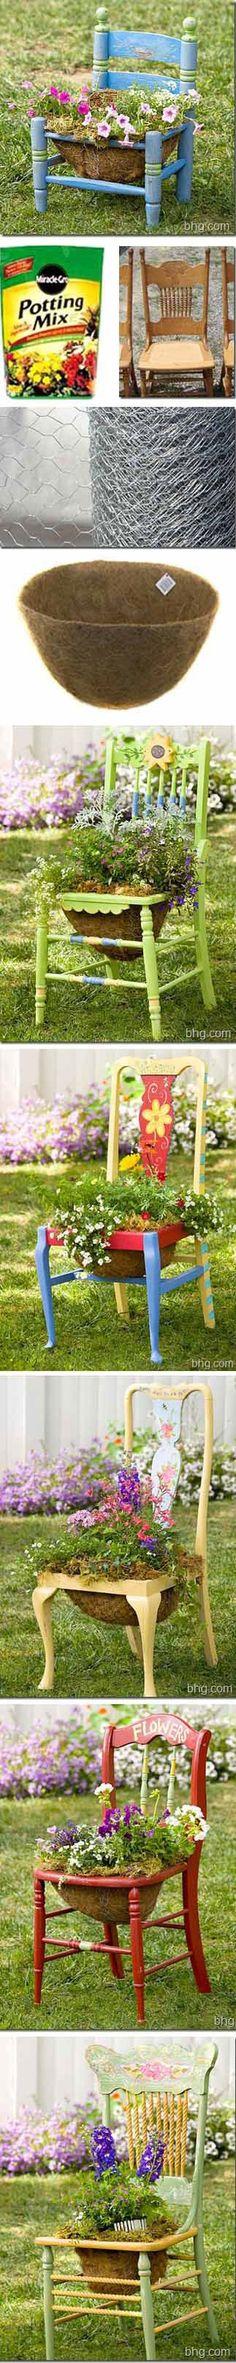 16 Ideas Flowers Garden In Front Of House Porches Old Chairs - Flower Garden İdeas İn Front Of House Garden Front Of House, House With Porch, House Front, Outdoor Crafts, Outdoor Projects, Garden Projects, Diy Garden, Dream Garden, Chair Planter